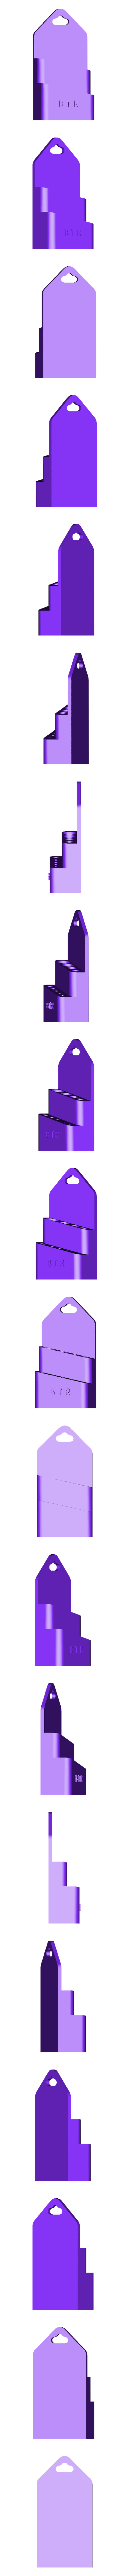 BTR.STL Download free STL file BTR / TORX support • 3D print design, alaingiresini